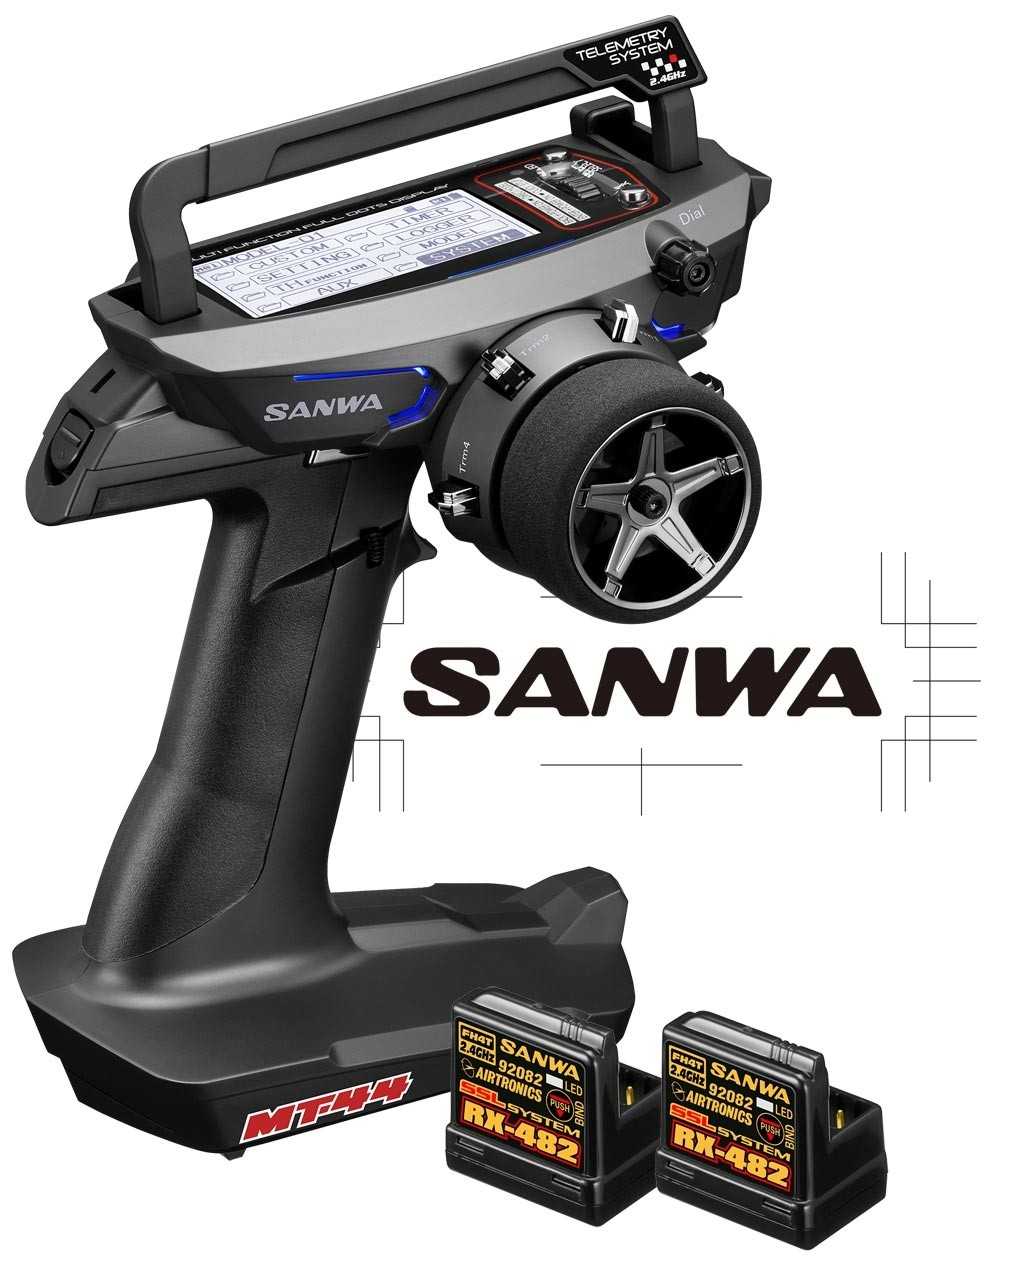 SANWA RADIO MT-44 PC + 2 RECEPTEURS RX482, 101A32171COMBO